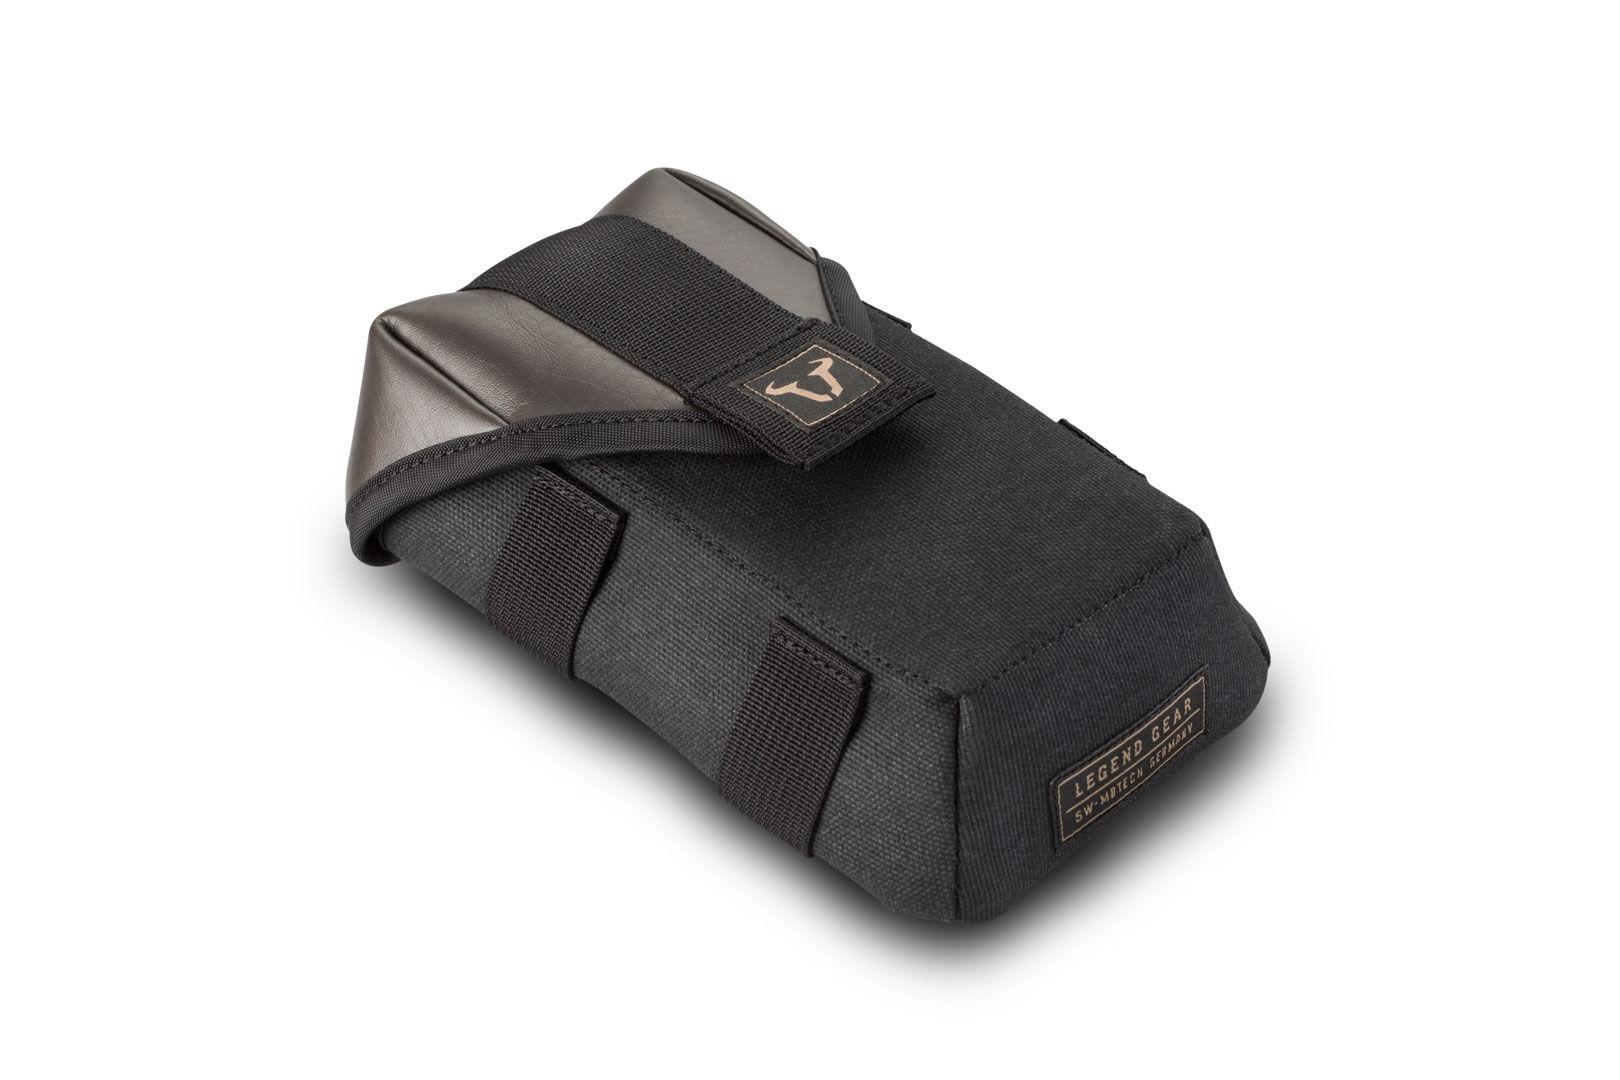 SW-Motech Legend Gear accessory bag LA1 - 0.8 l. Splash-proof. accessory bag LA1 0,8 Liter Splash-proof